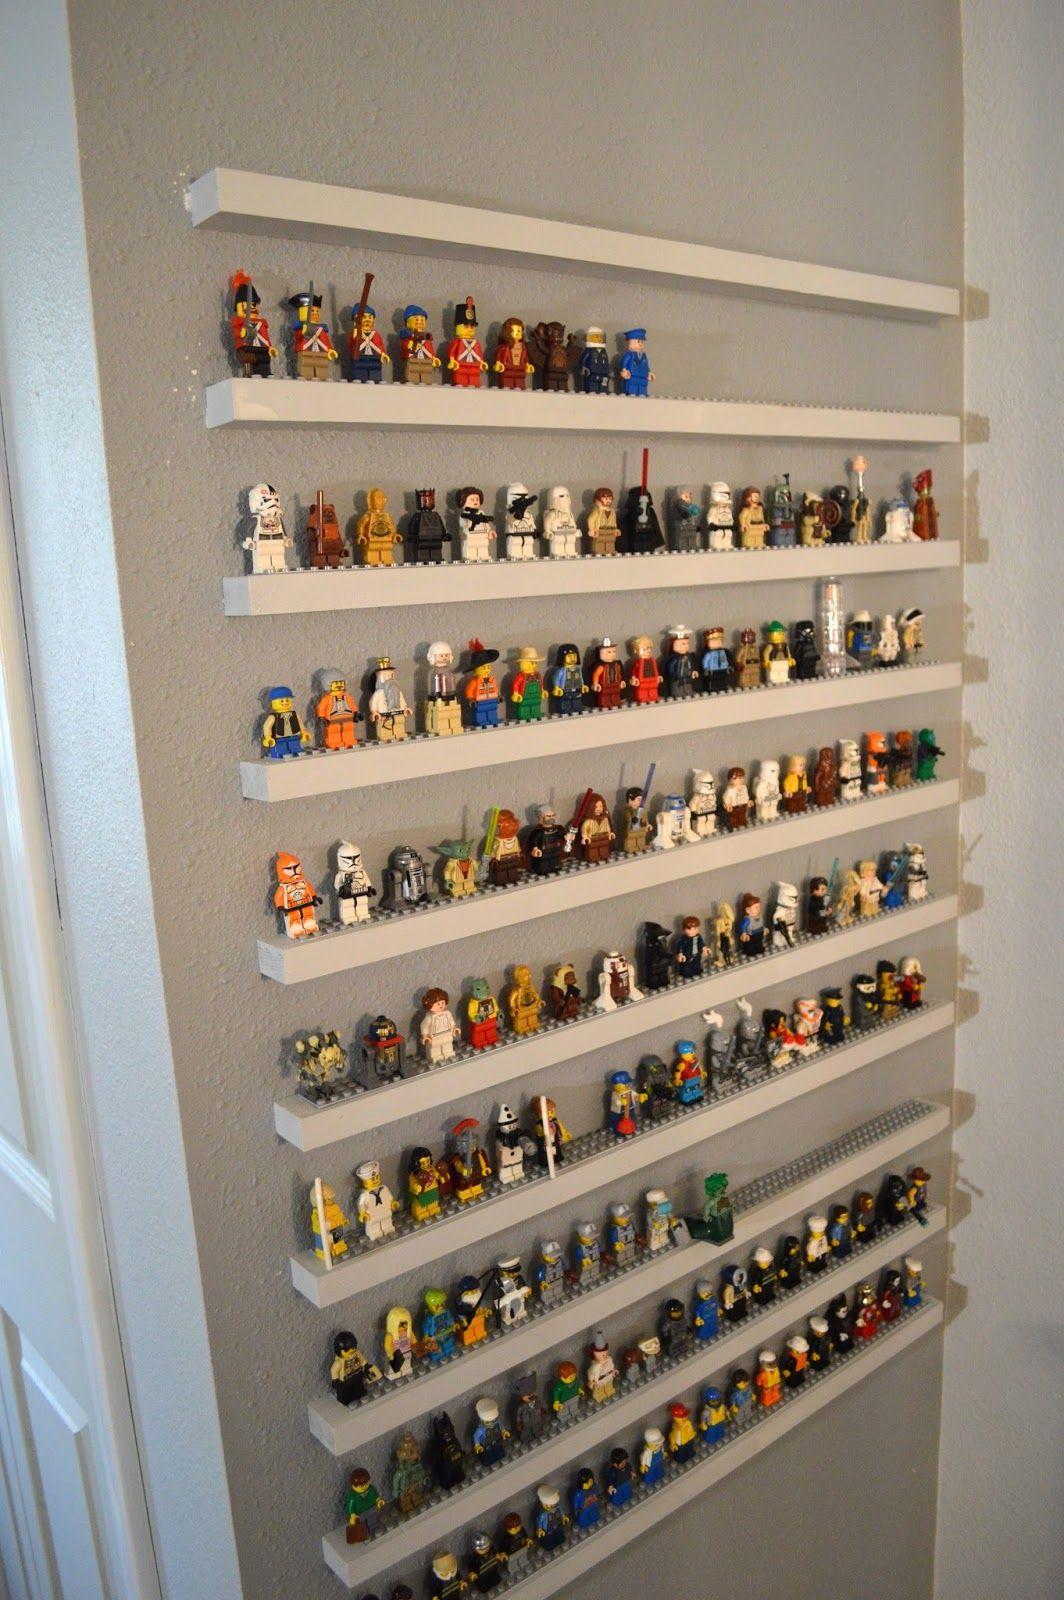 lego wall display shelf jedi craft girl diy lego minifigure rh br pinterest com how to diy display shelf how to build a liquor display shelf